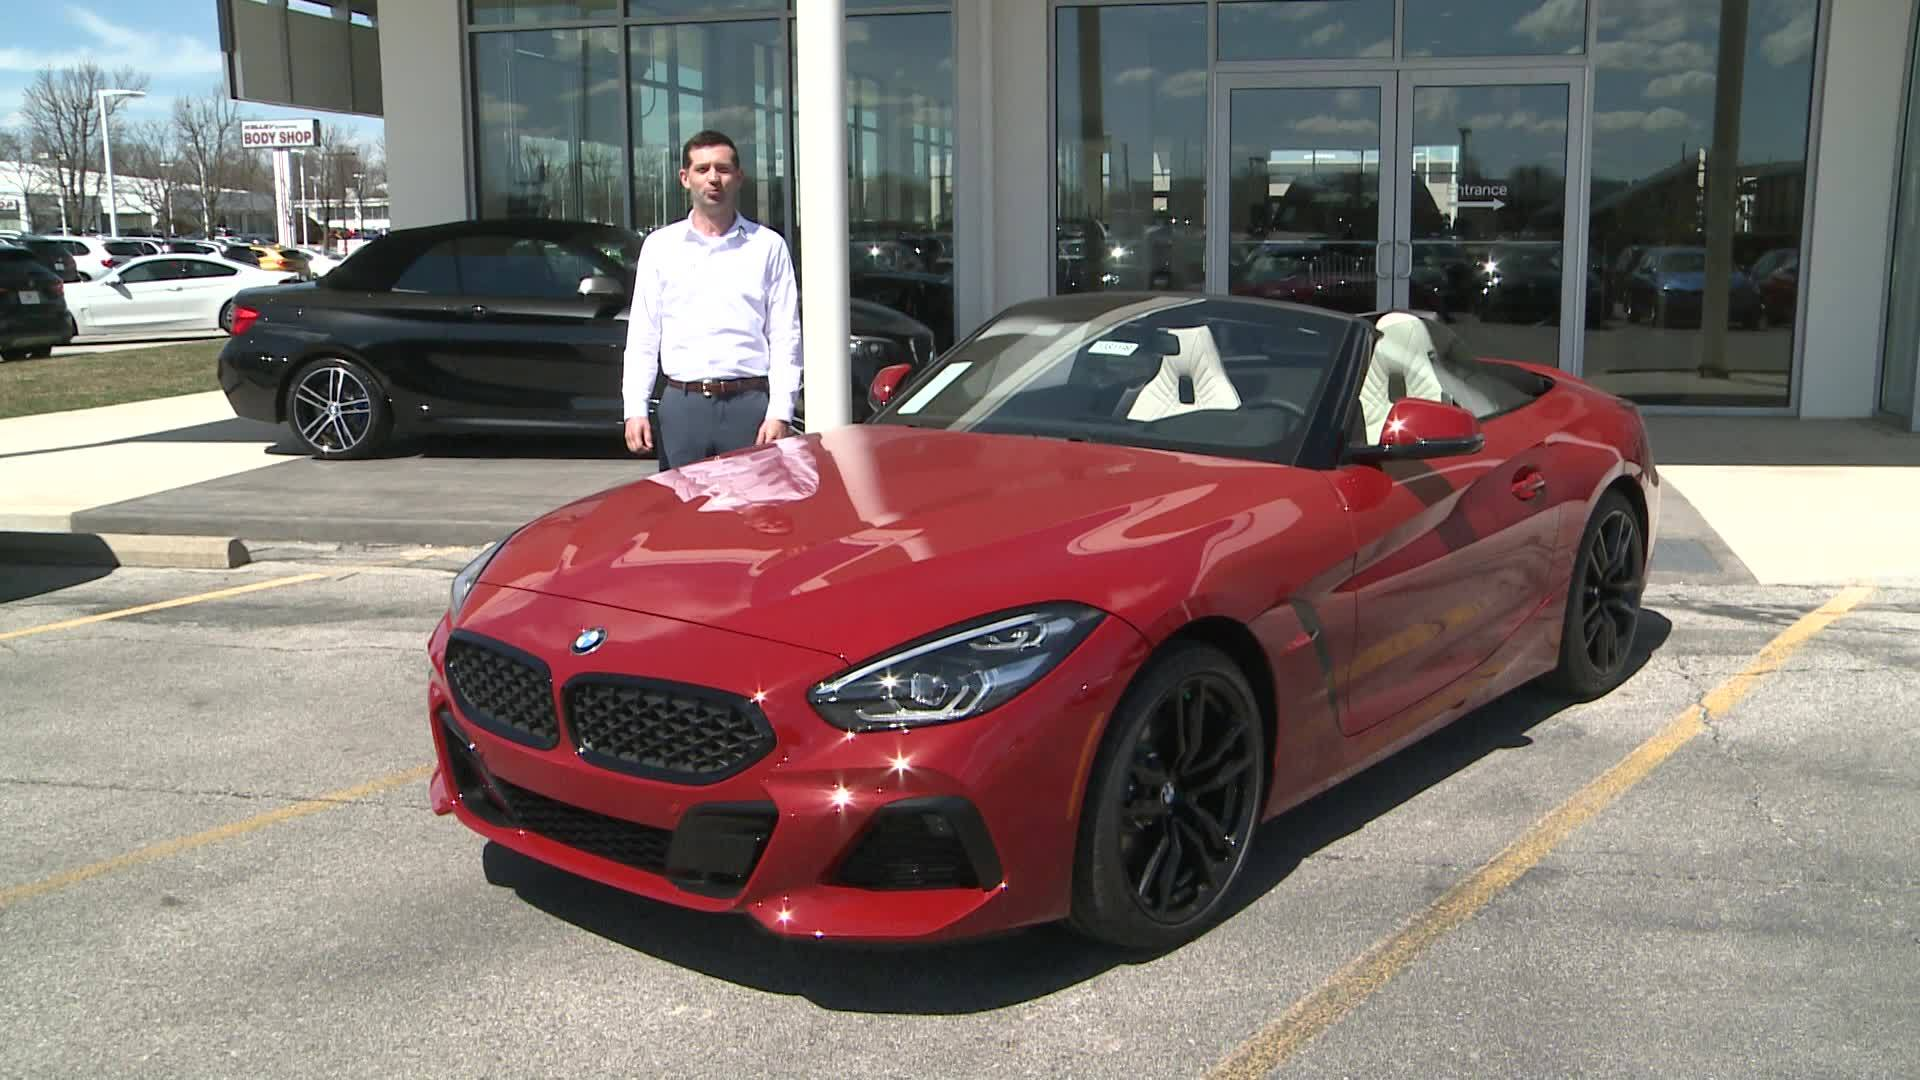 Two-Minute Test Drive - 2019 BMW Z4